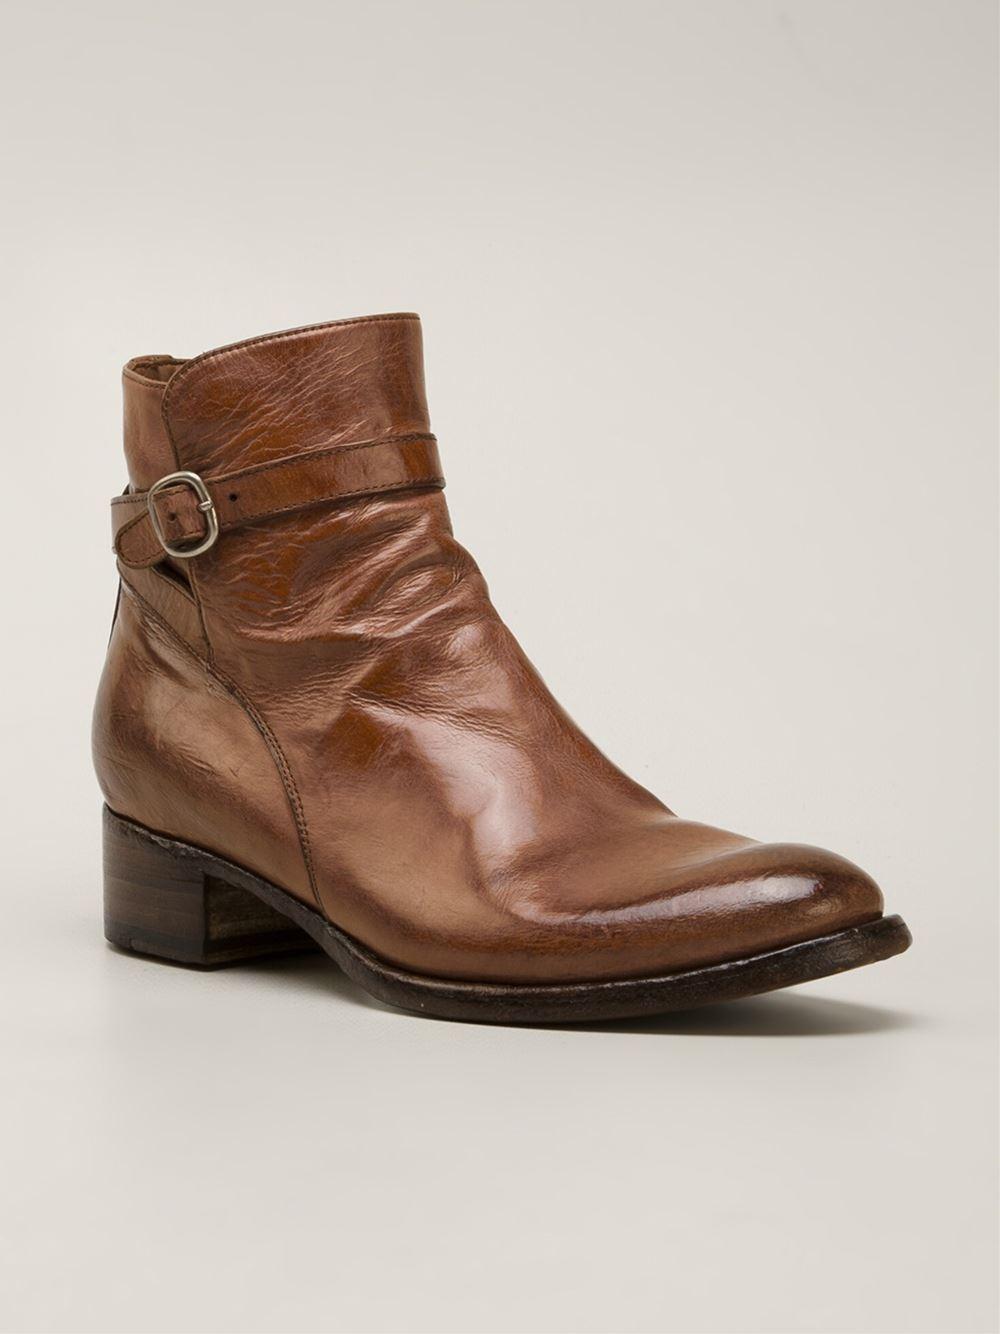 Luxury Officine Creative Womenu2019s Slip On Derby Shoes U2013 Aallshoestyle